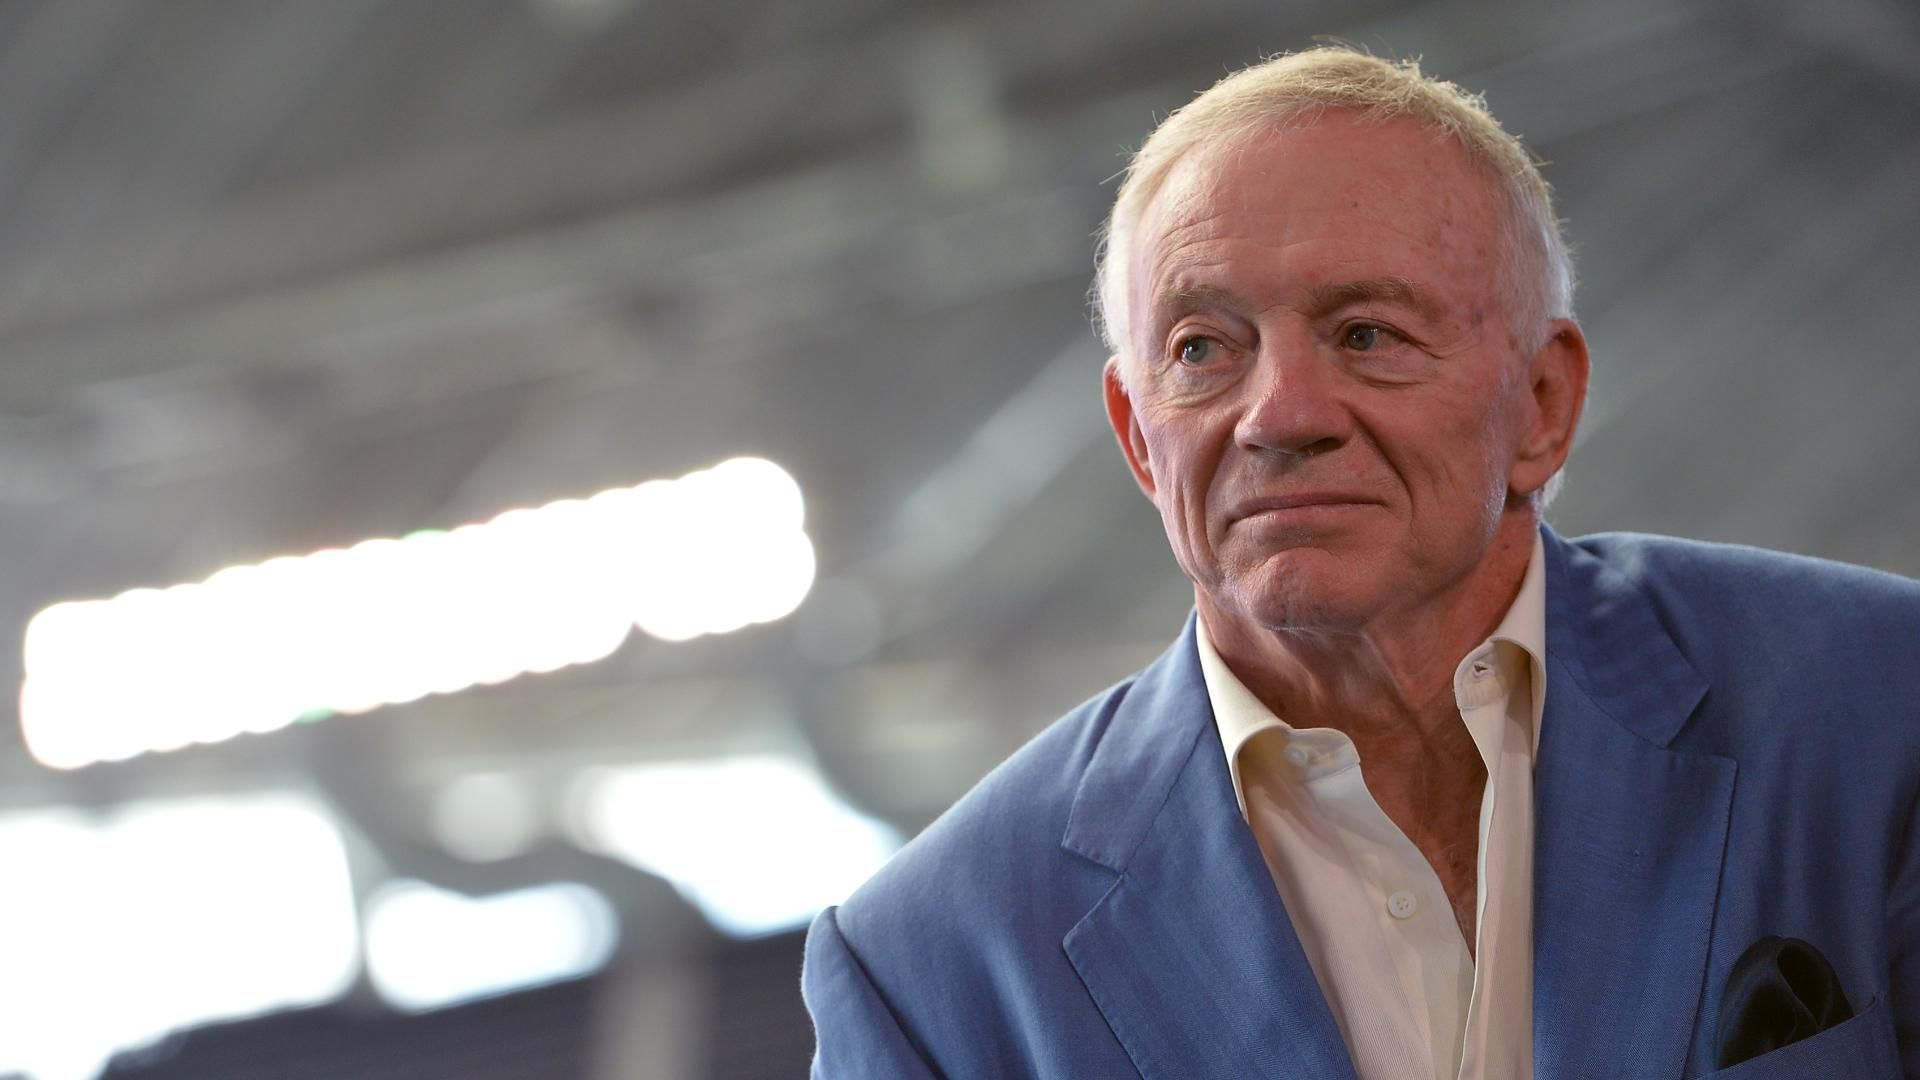 Cowboys Headlines - Analyzing Cowboys Salary Cap & The Draft